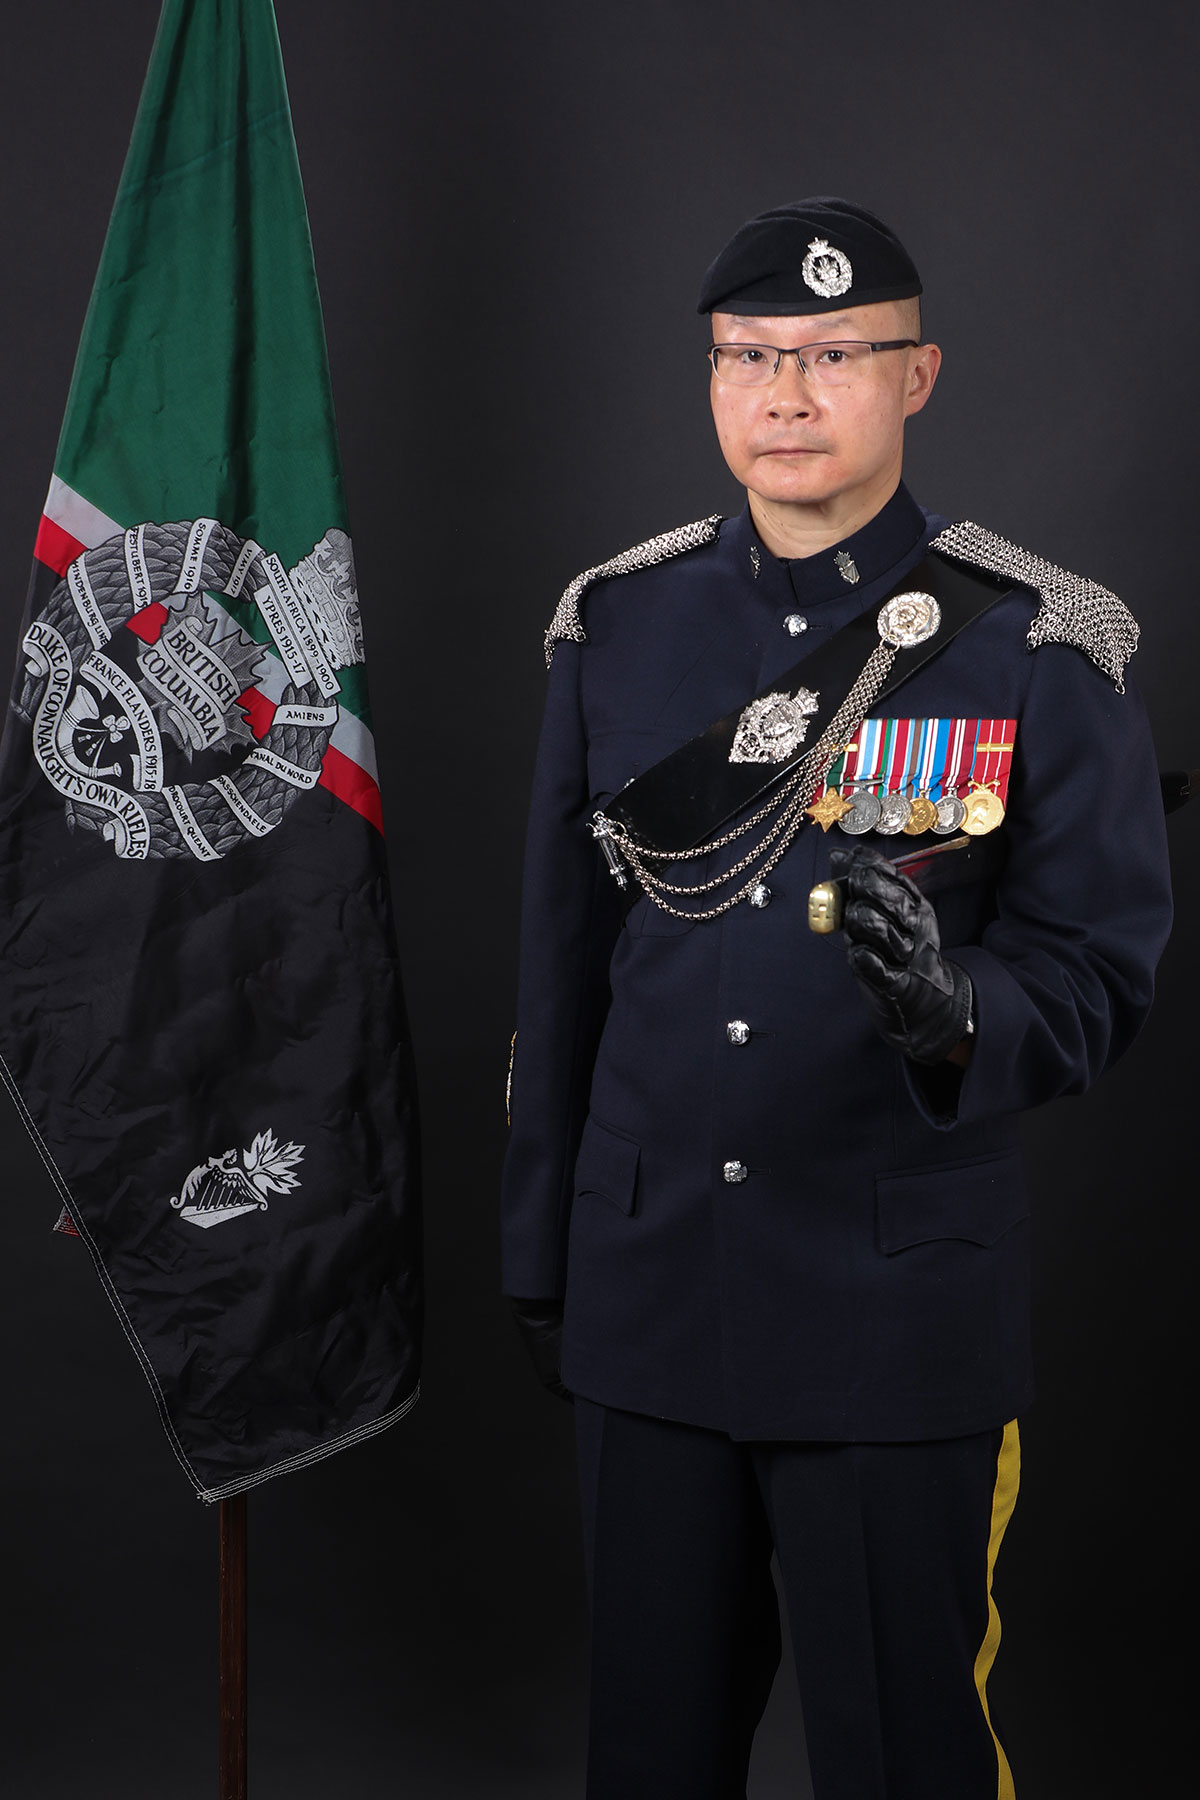 Chief Warrant Officer A.C. Harris, CD